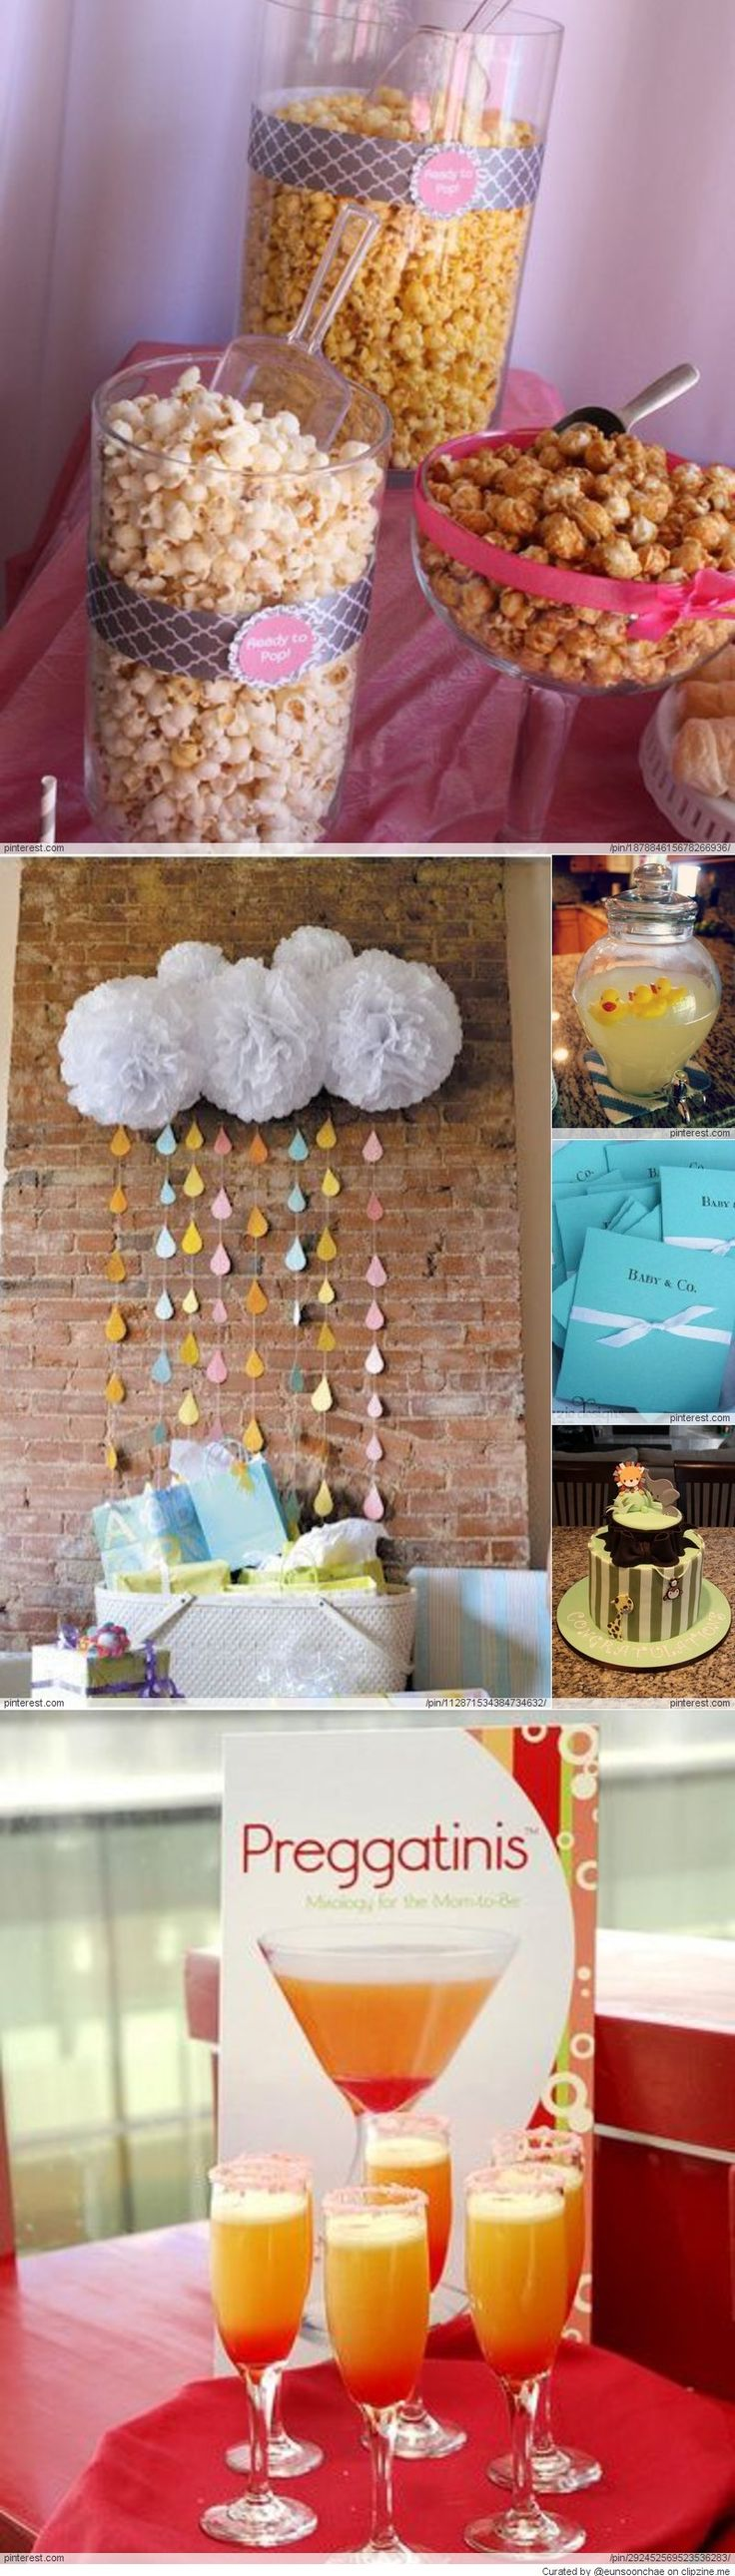 Baby Shower Decorations & Themes. Love the Preggatini idea!